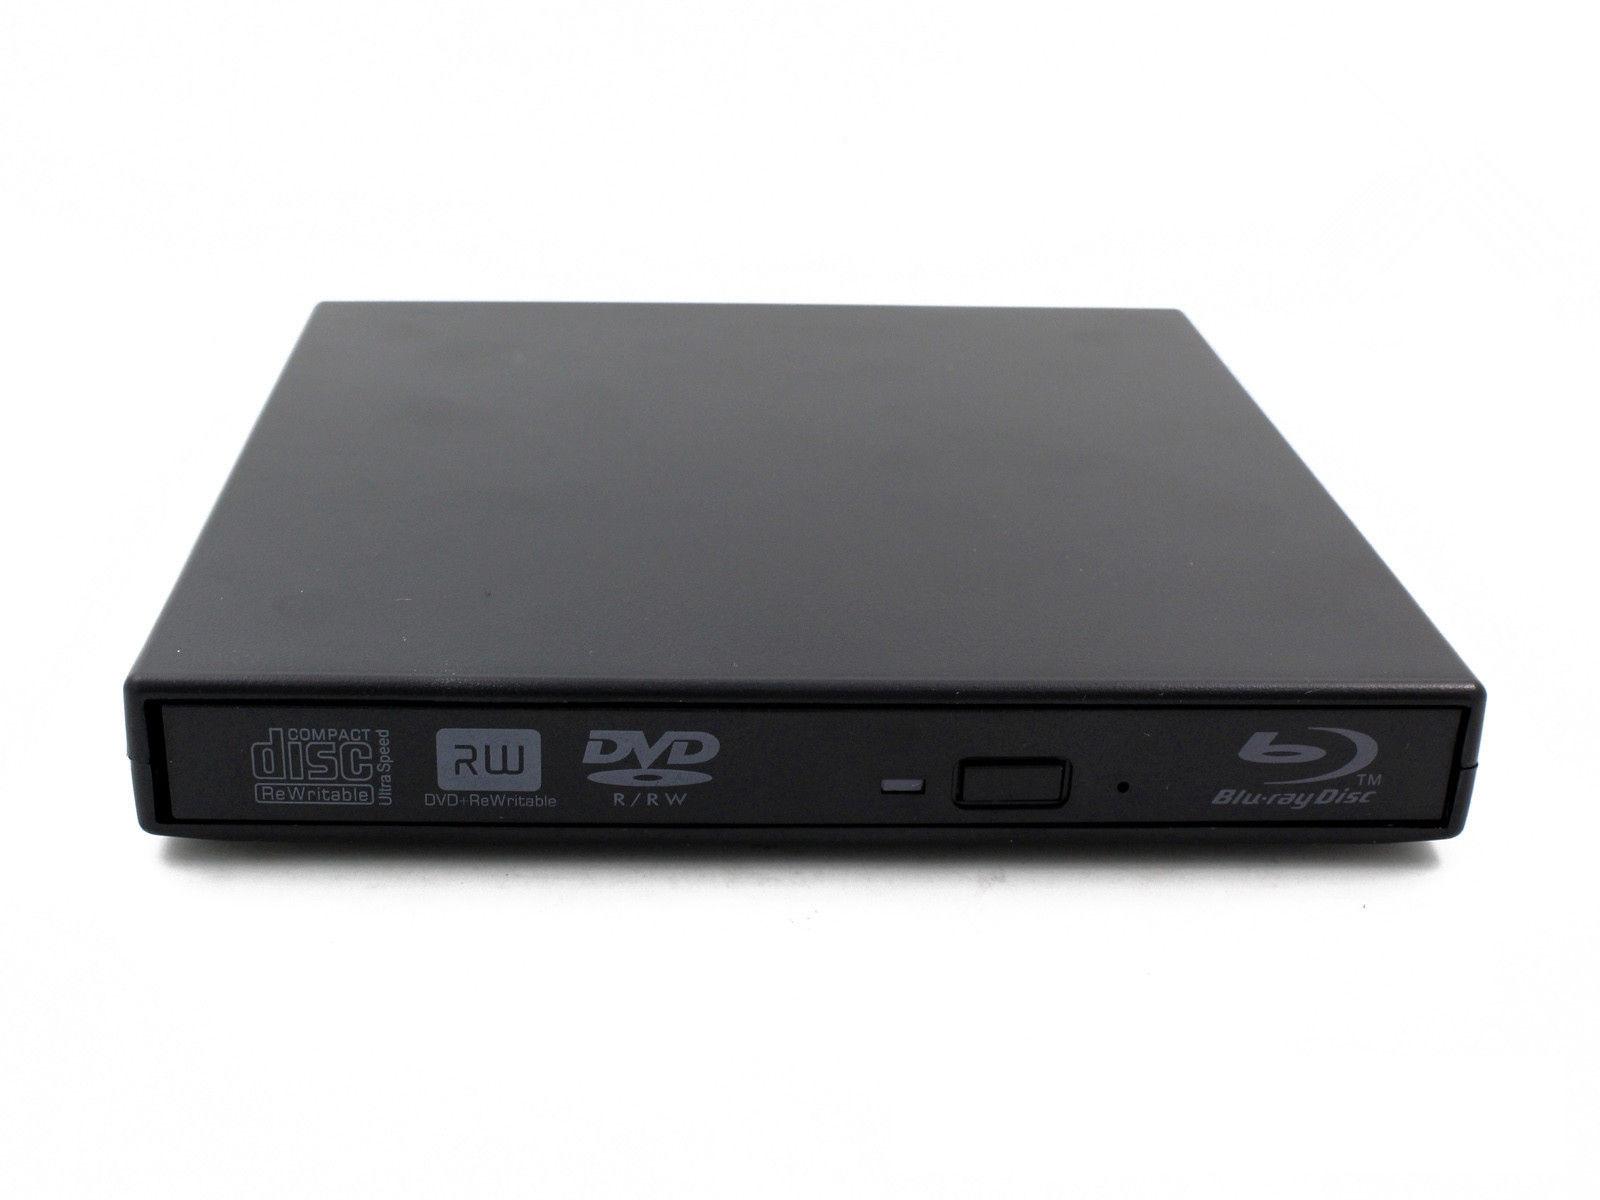 Externo para Panasonic Blu-ray Burner Bd-re Dvd rw Drive Usb Uj-240 6x